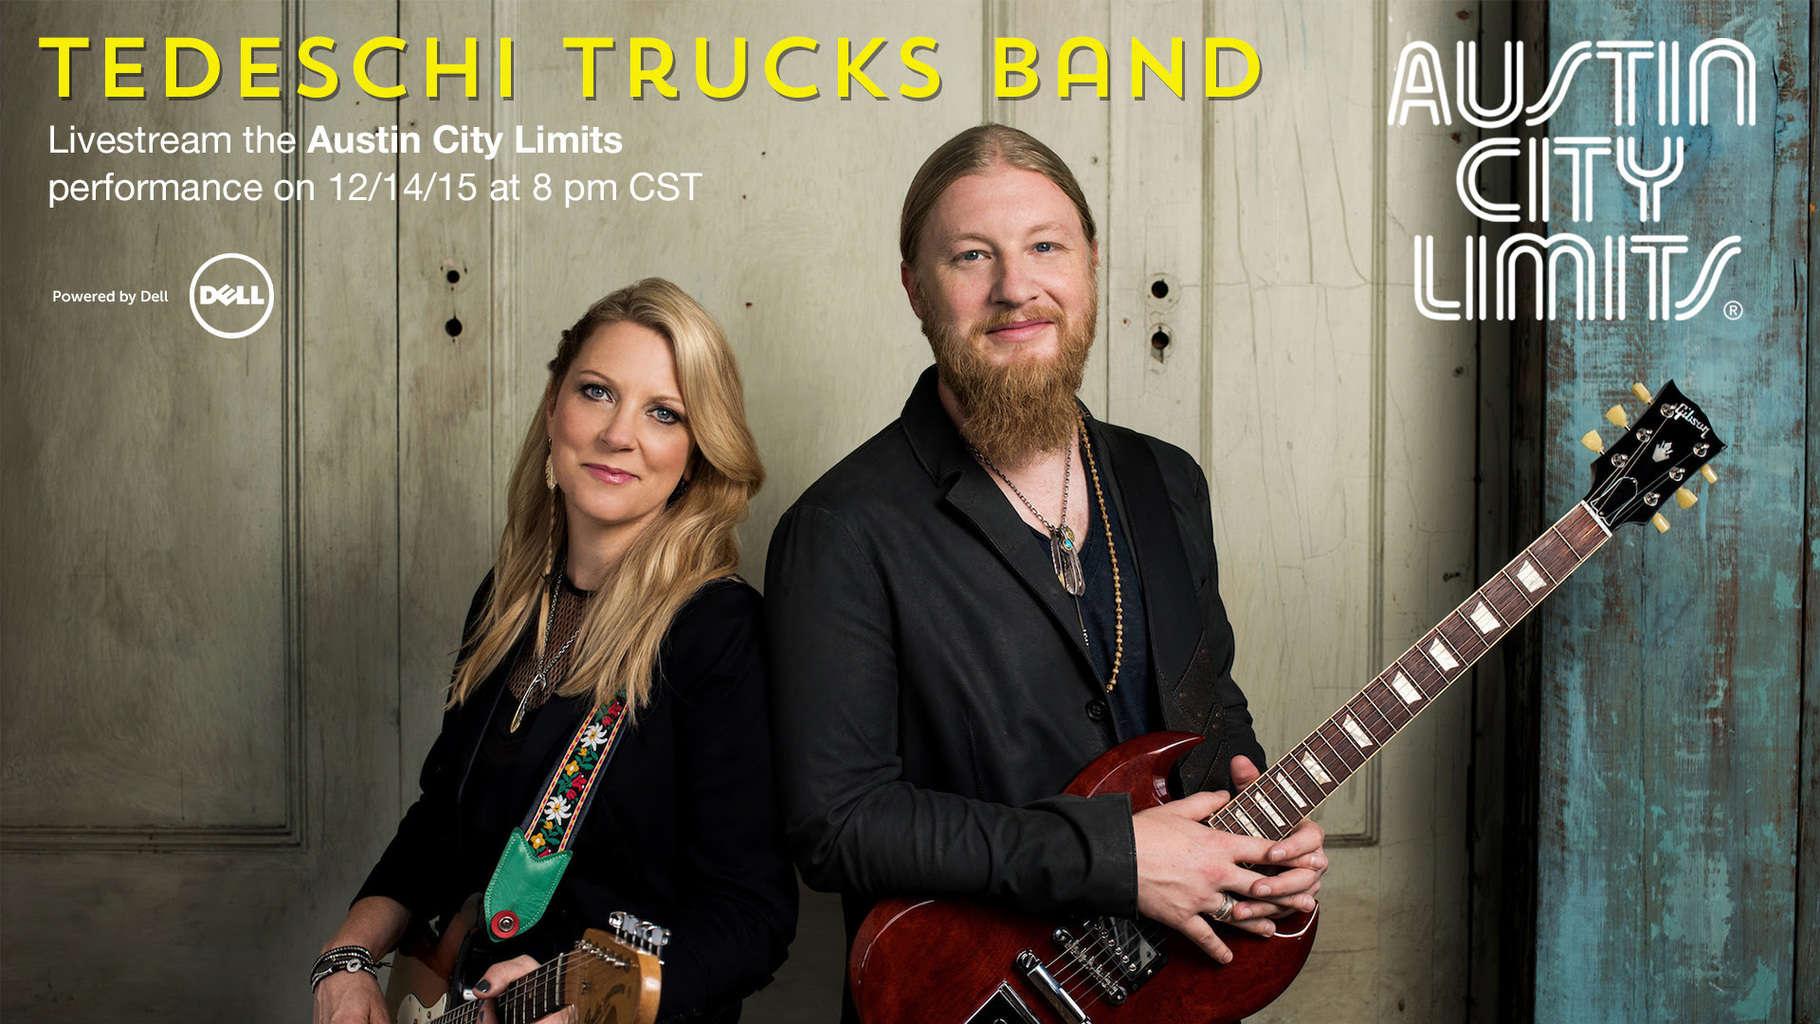 Tedeschi Trucks Band Austin City Limits Live Stream